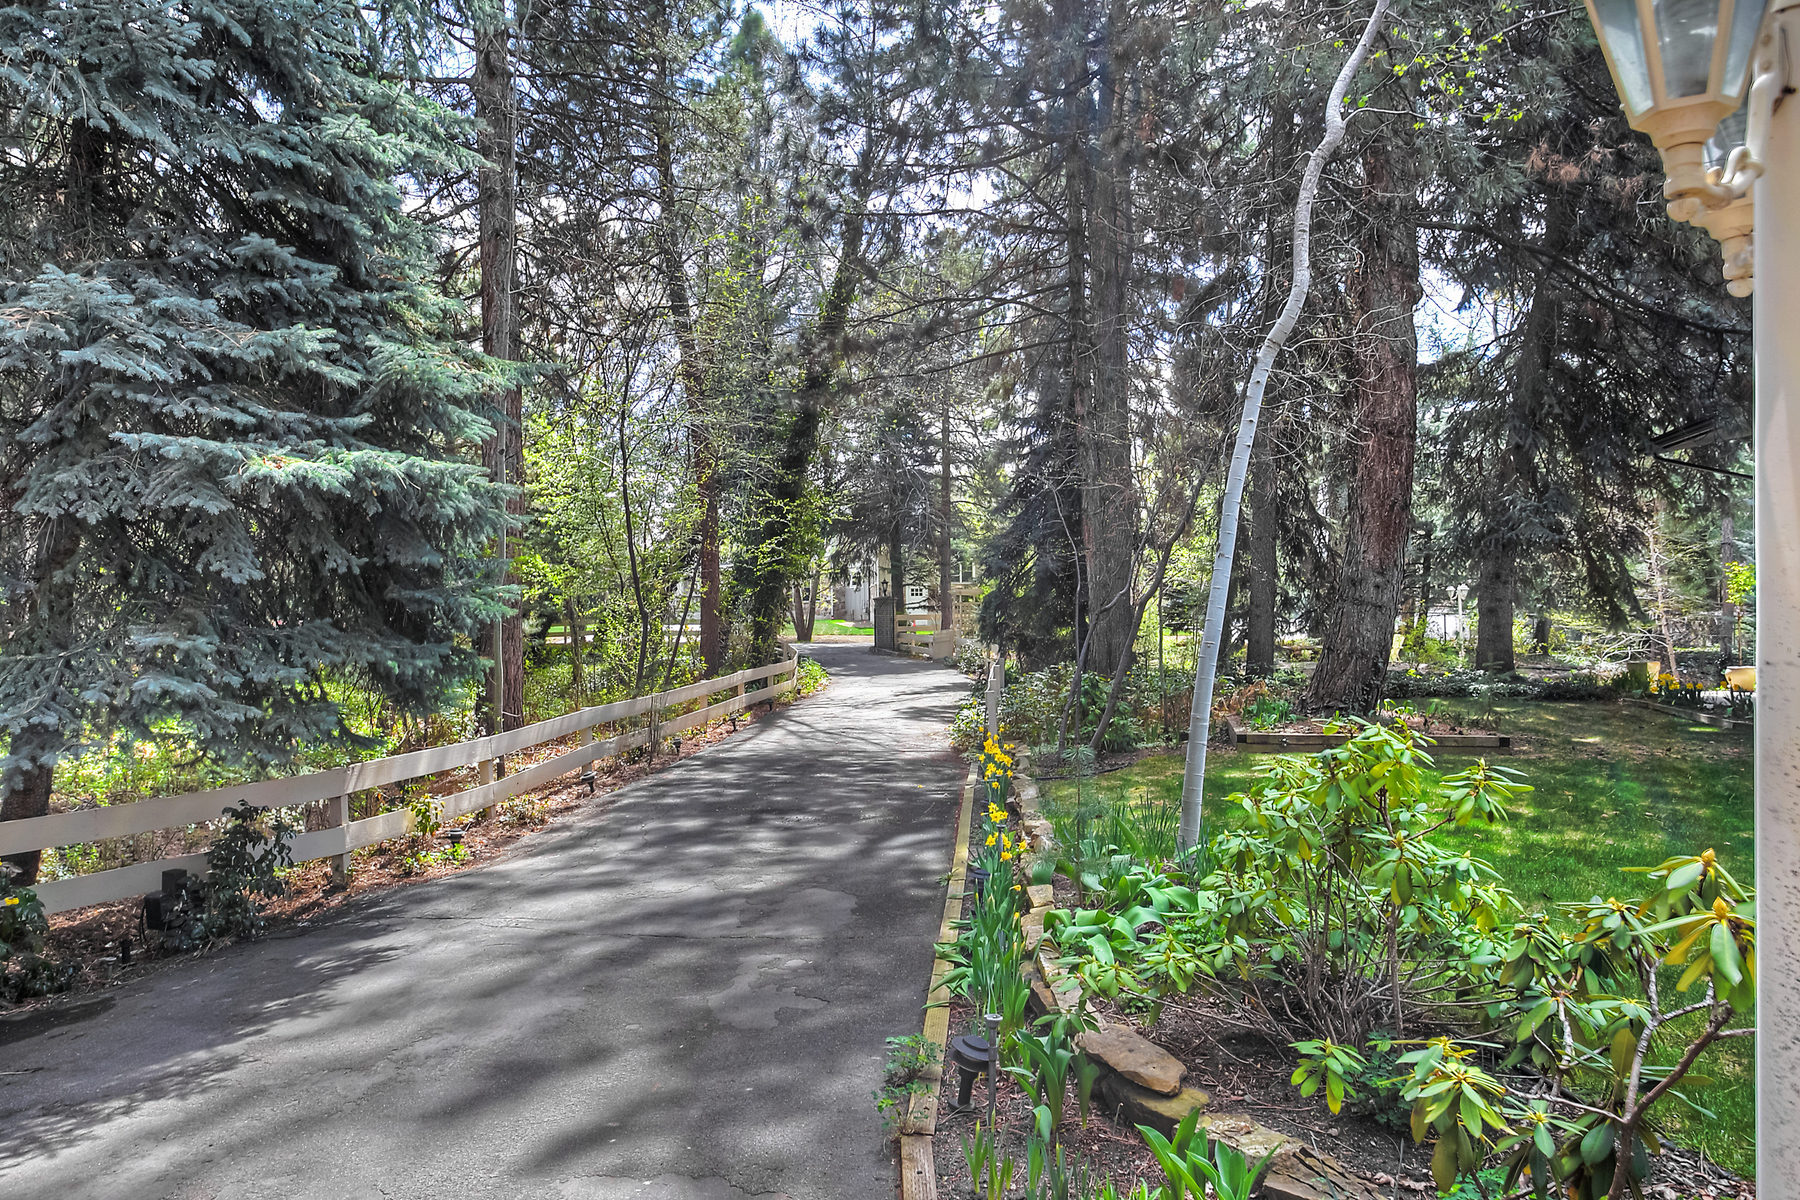 Villa per Vendita alle ore Tranquil Estate Lot with Private Lane 7740 Forest Bend Dr Salt Lake City, Utah 84121 Stati Uniti